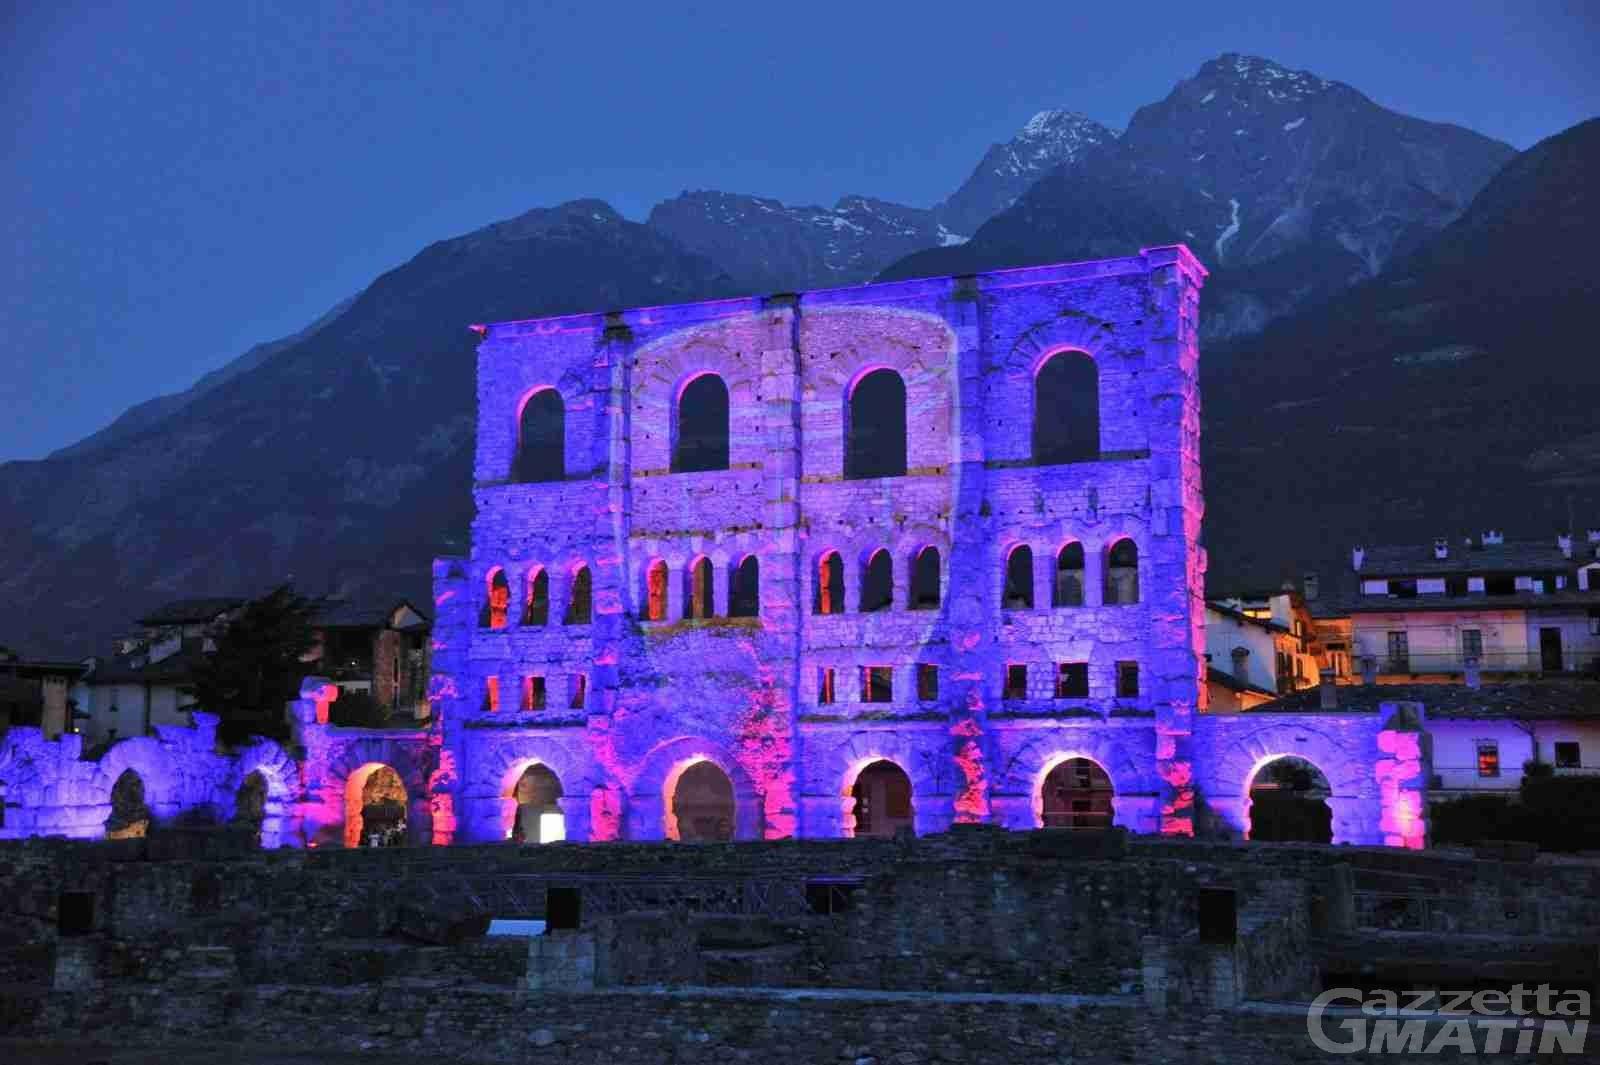 Turismo: 578 mila presenze tra eventi e ingressi a mostre e castelli